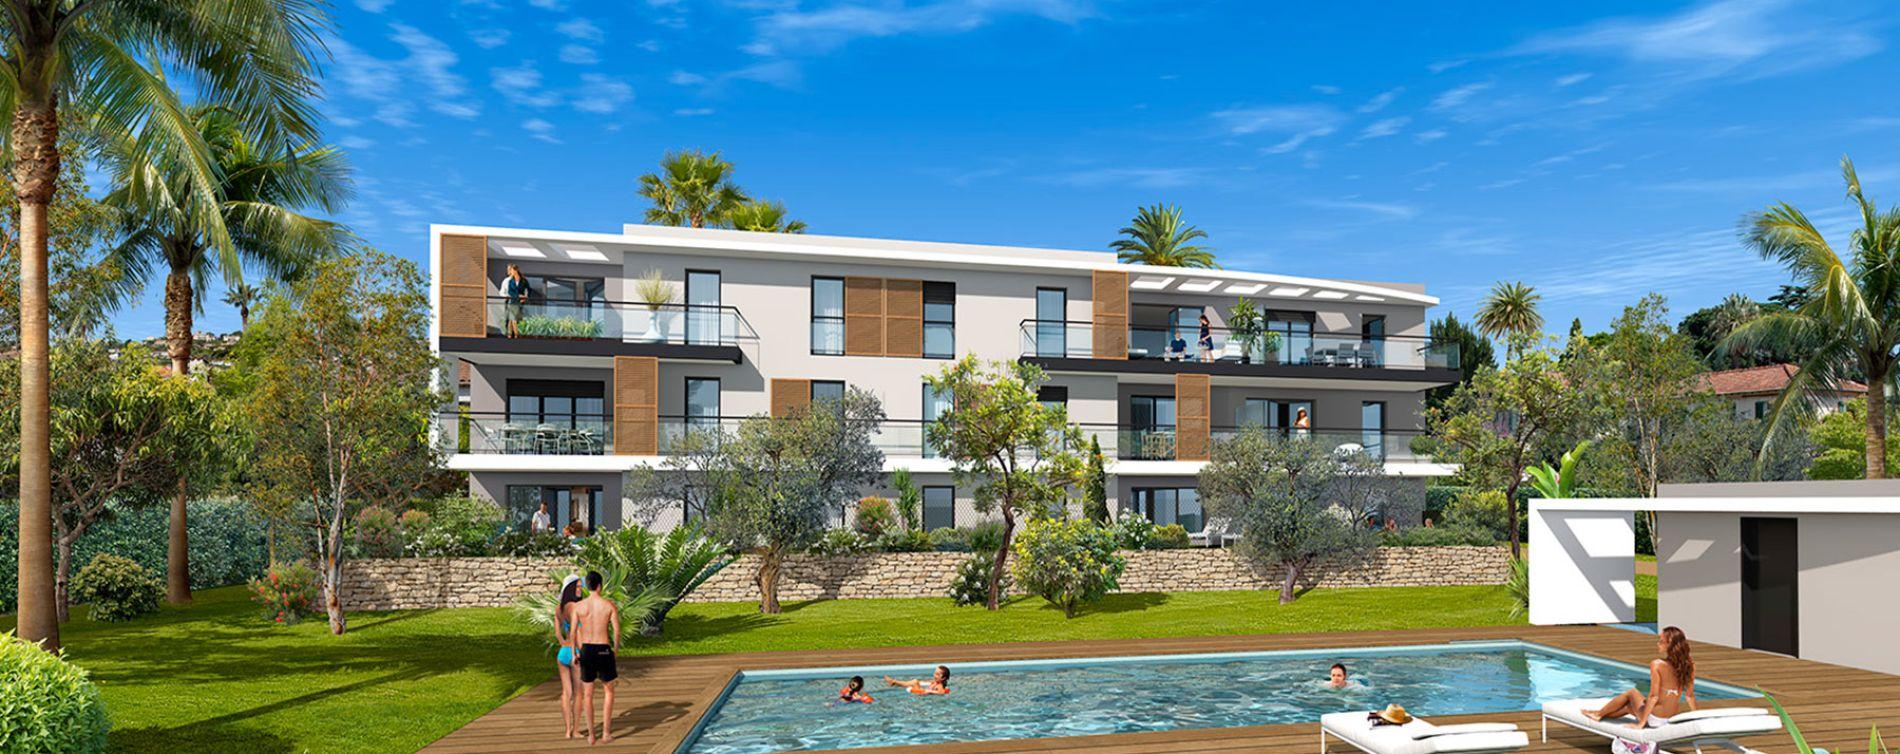 Résidence Villa Palma à Golfe-juan